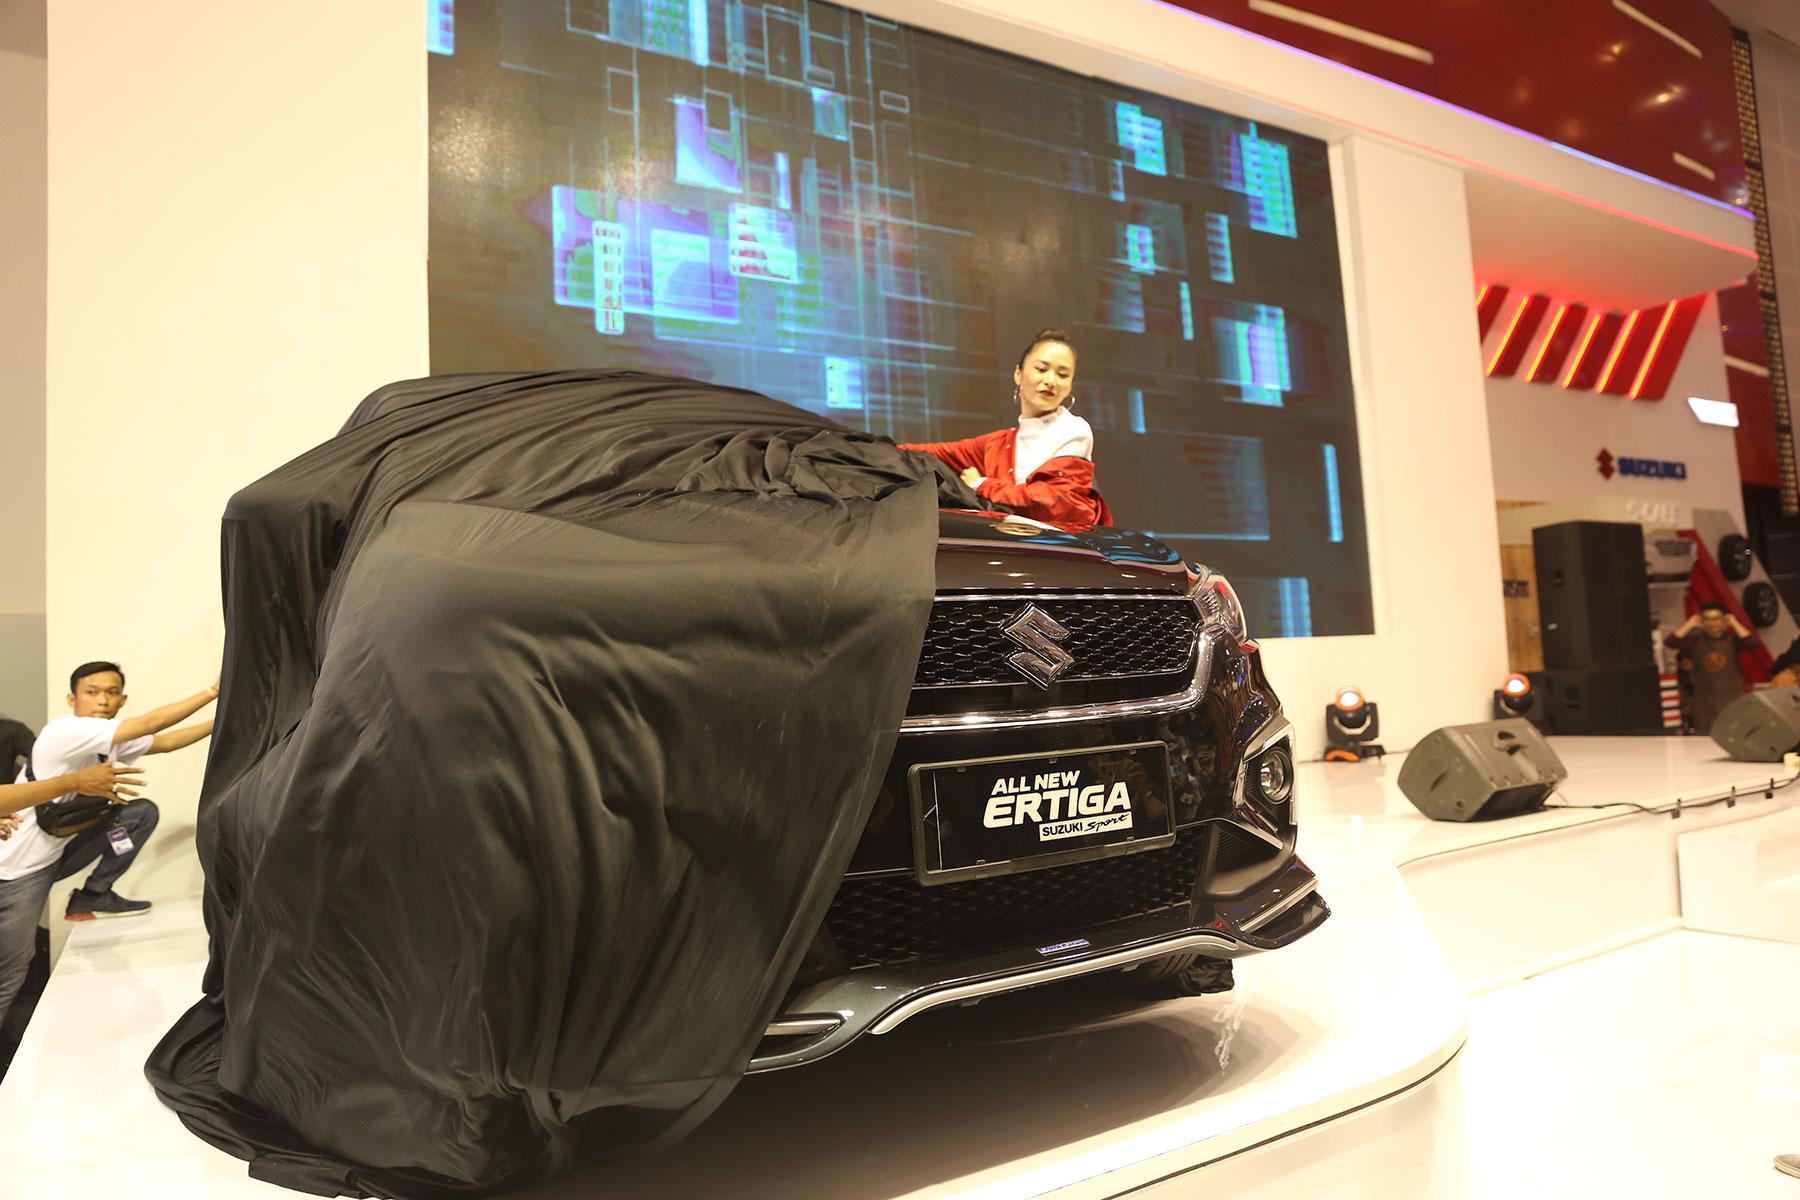 GIIAS Surabaya 2020 Digelar 10 Hari, Bisa Puas Lihat Kendaraan Terkini